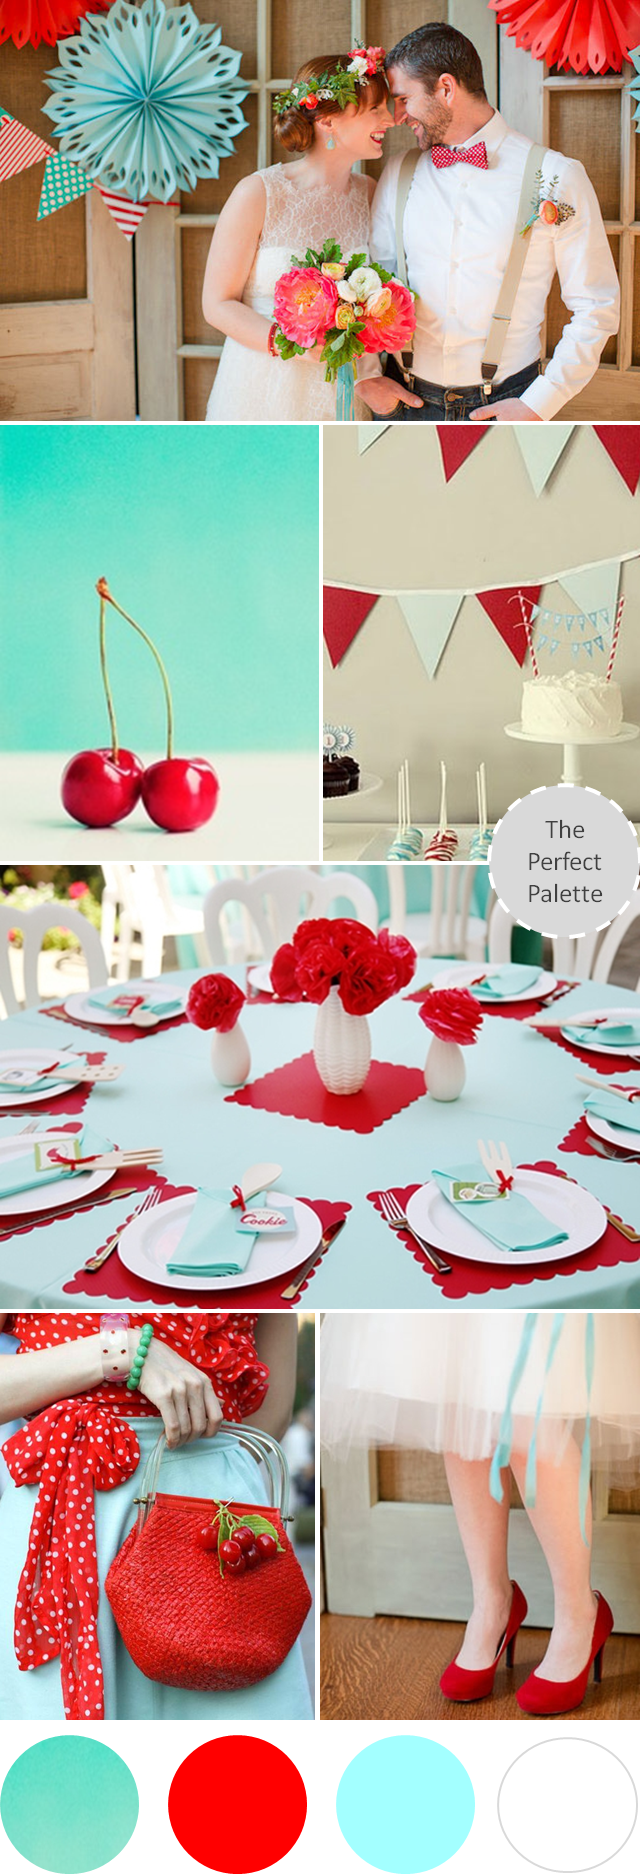 Wedding Colors I Love | Pinterest | Aqua, Weddings and Wedding